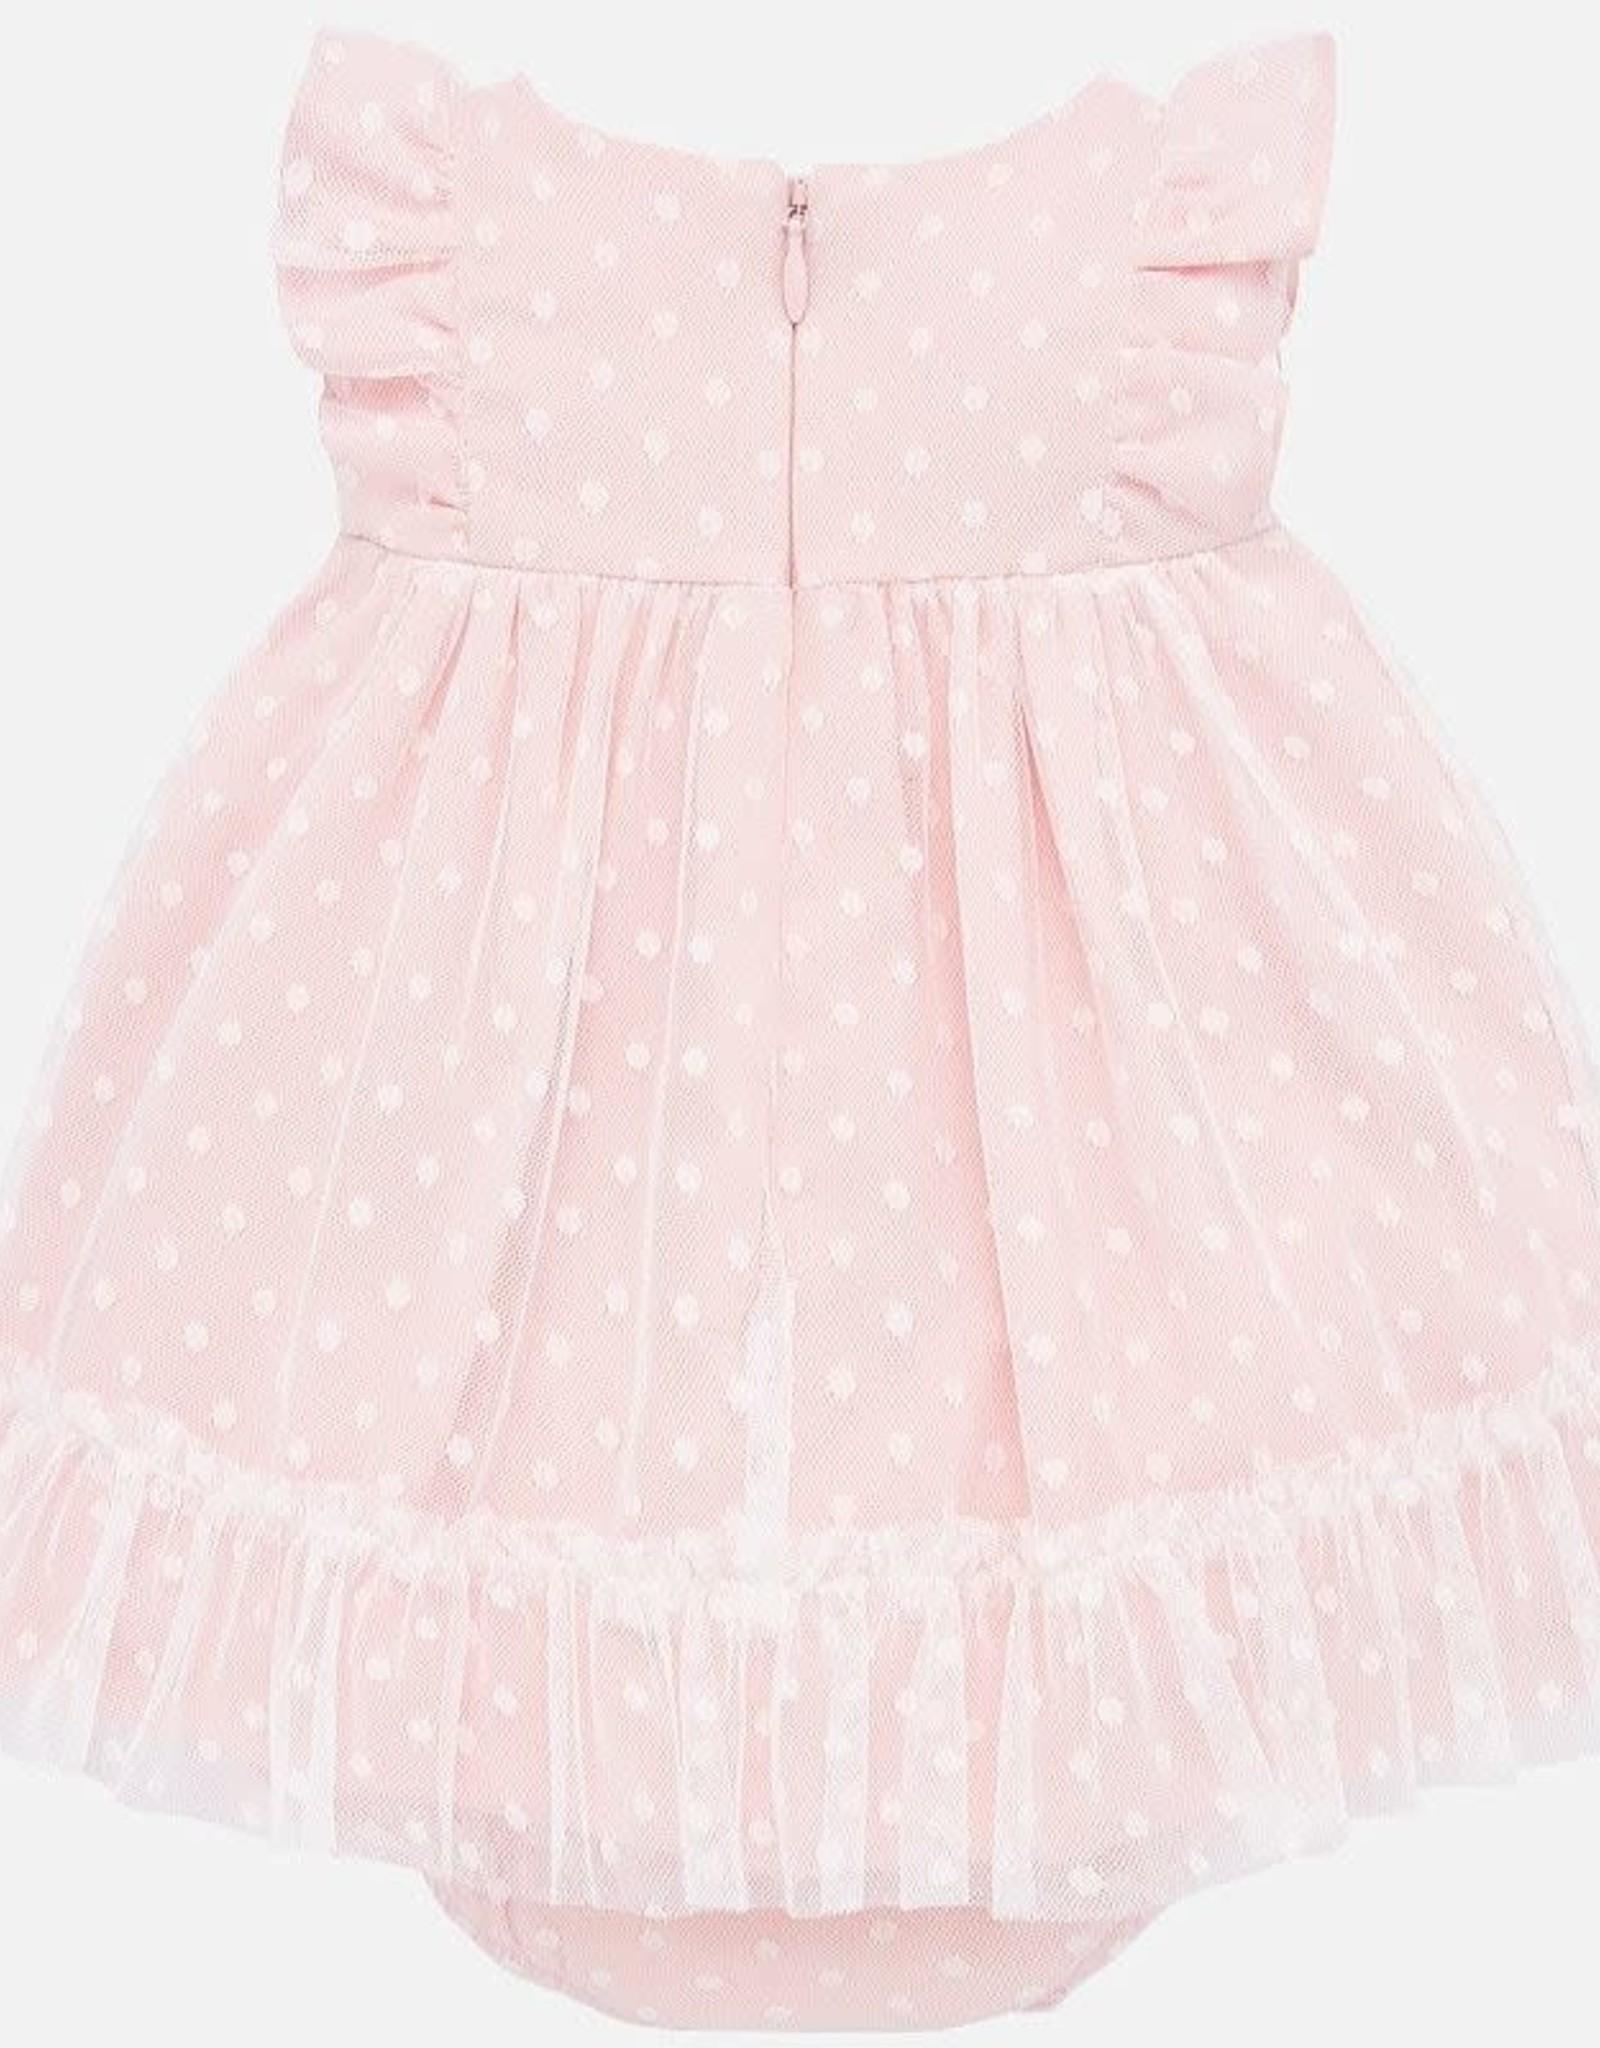 Telle Plumeti Dress